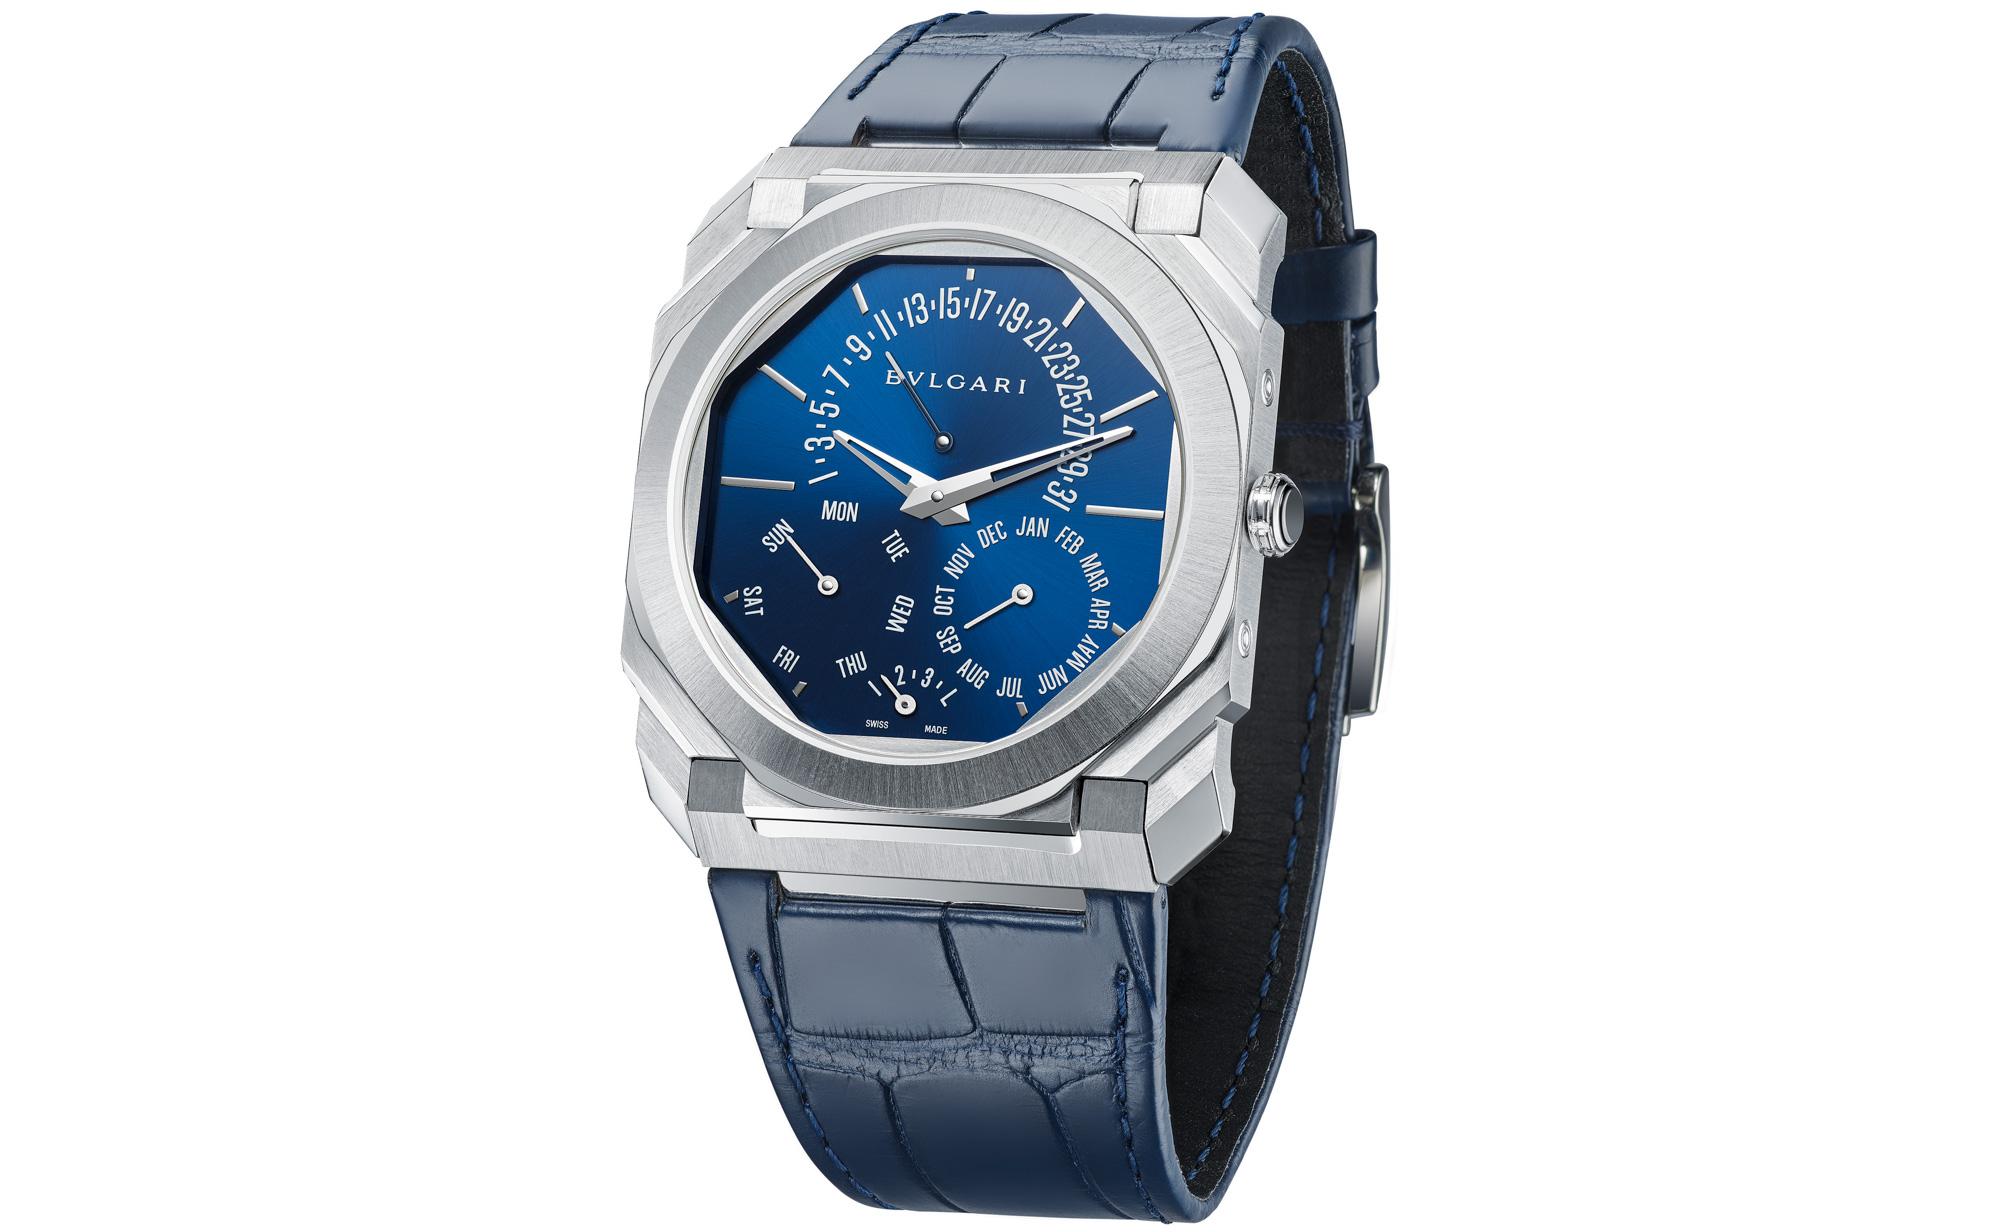 Bulgari Octo Finissimo Perpetual Calendar Watch–Ultra Thin World Record Dress Watch 2021 30